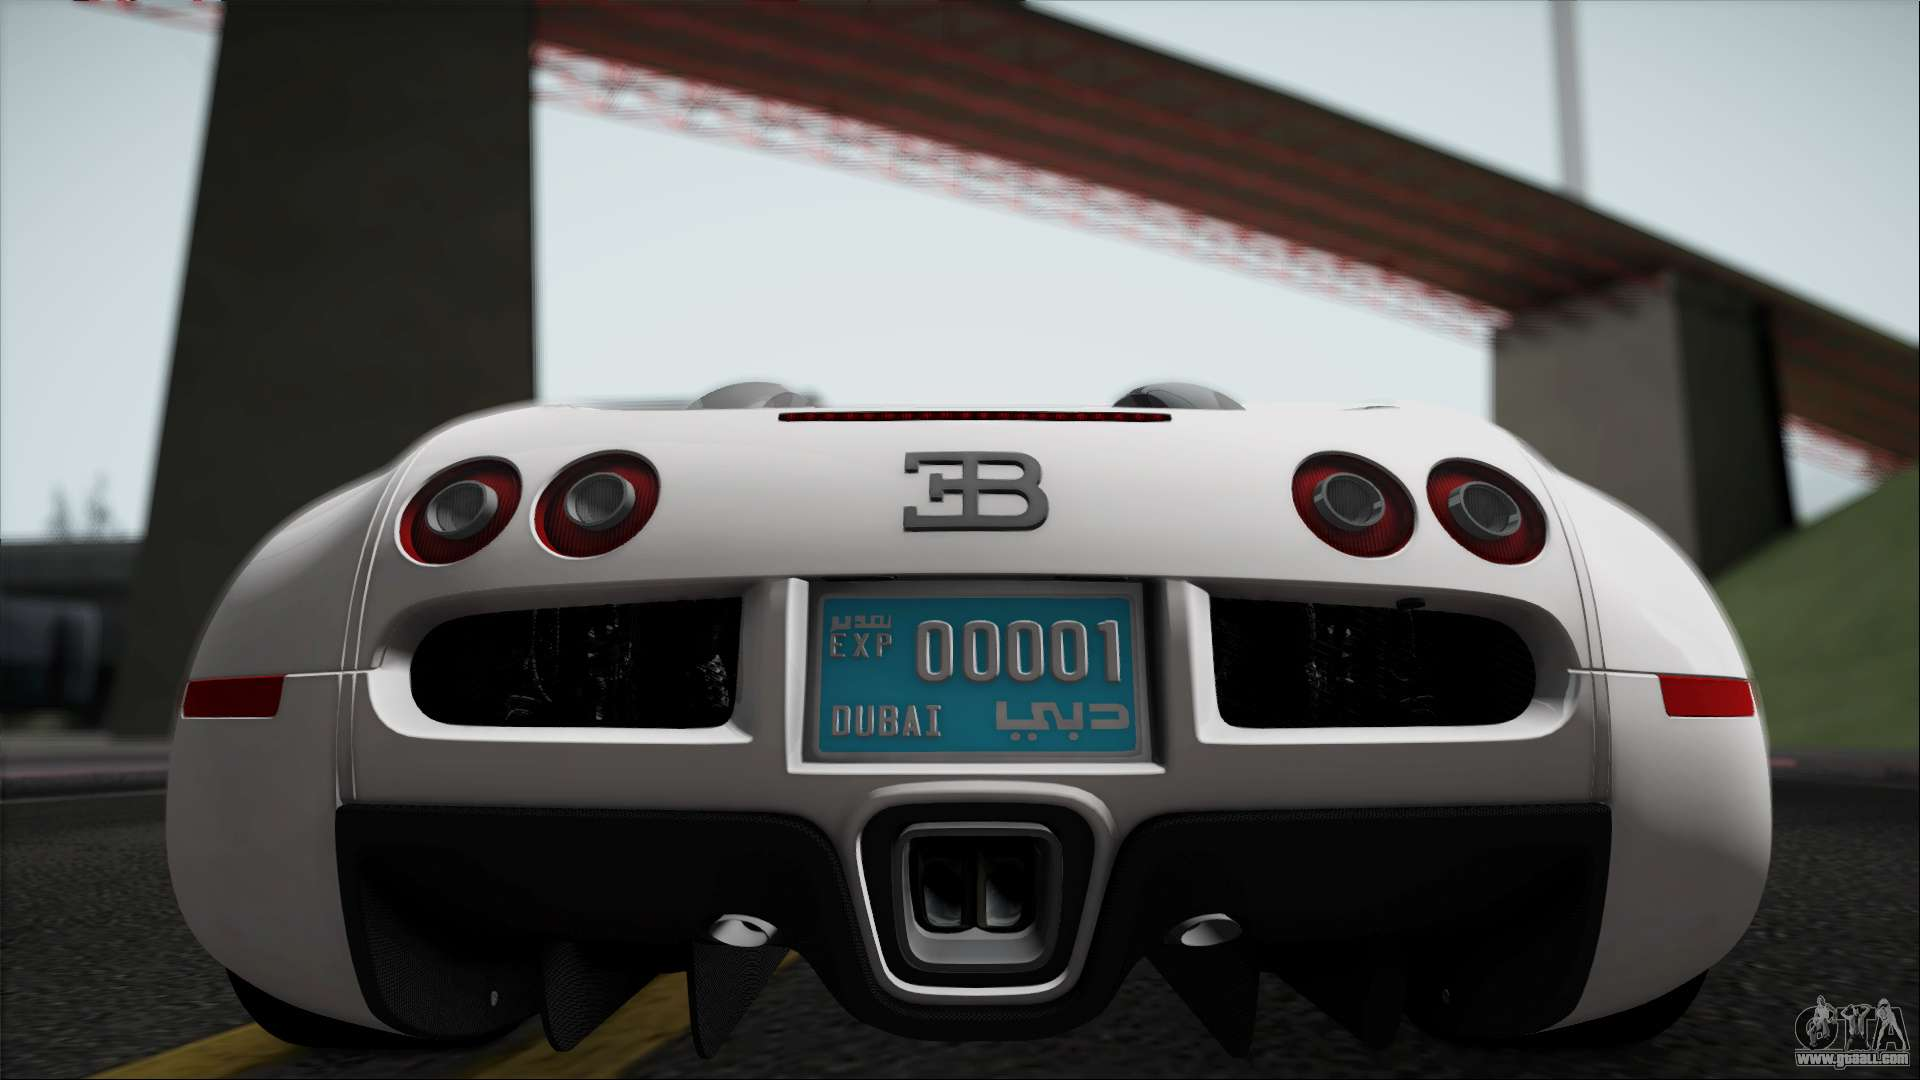 204135-proxy-sa-2014-08-06-02-15-07-702 Wonderful Bugatti Veyron Xbox 360 Games Cars Trend